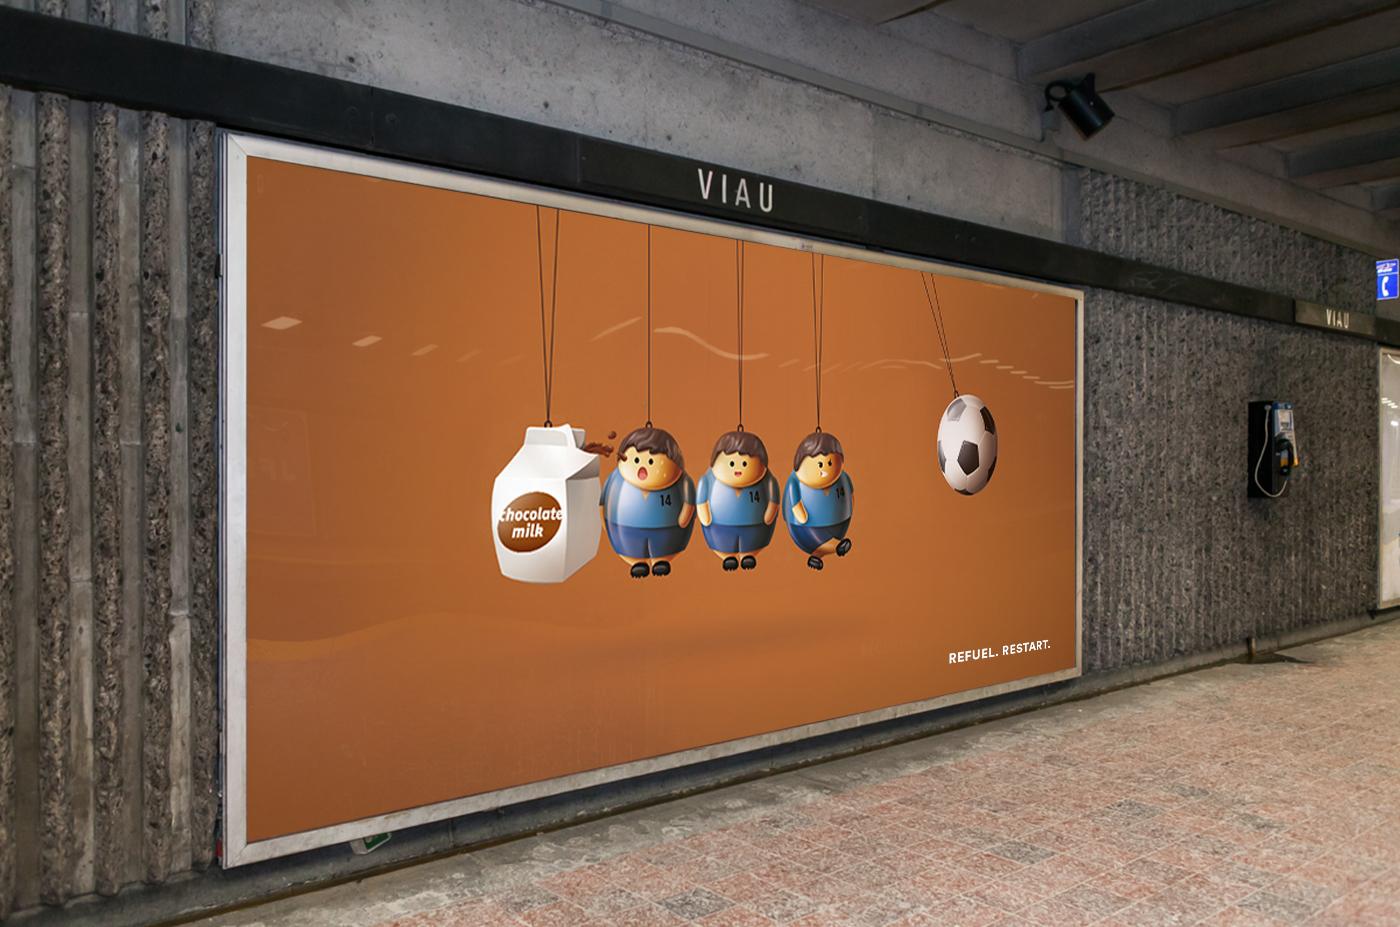 Advertising ,milk,chocolat,concept,Montreal,Quebec,tennis,Boxe,soccer